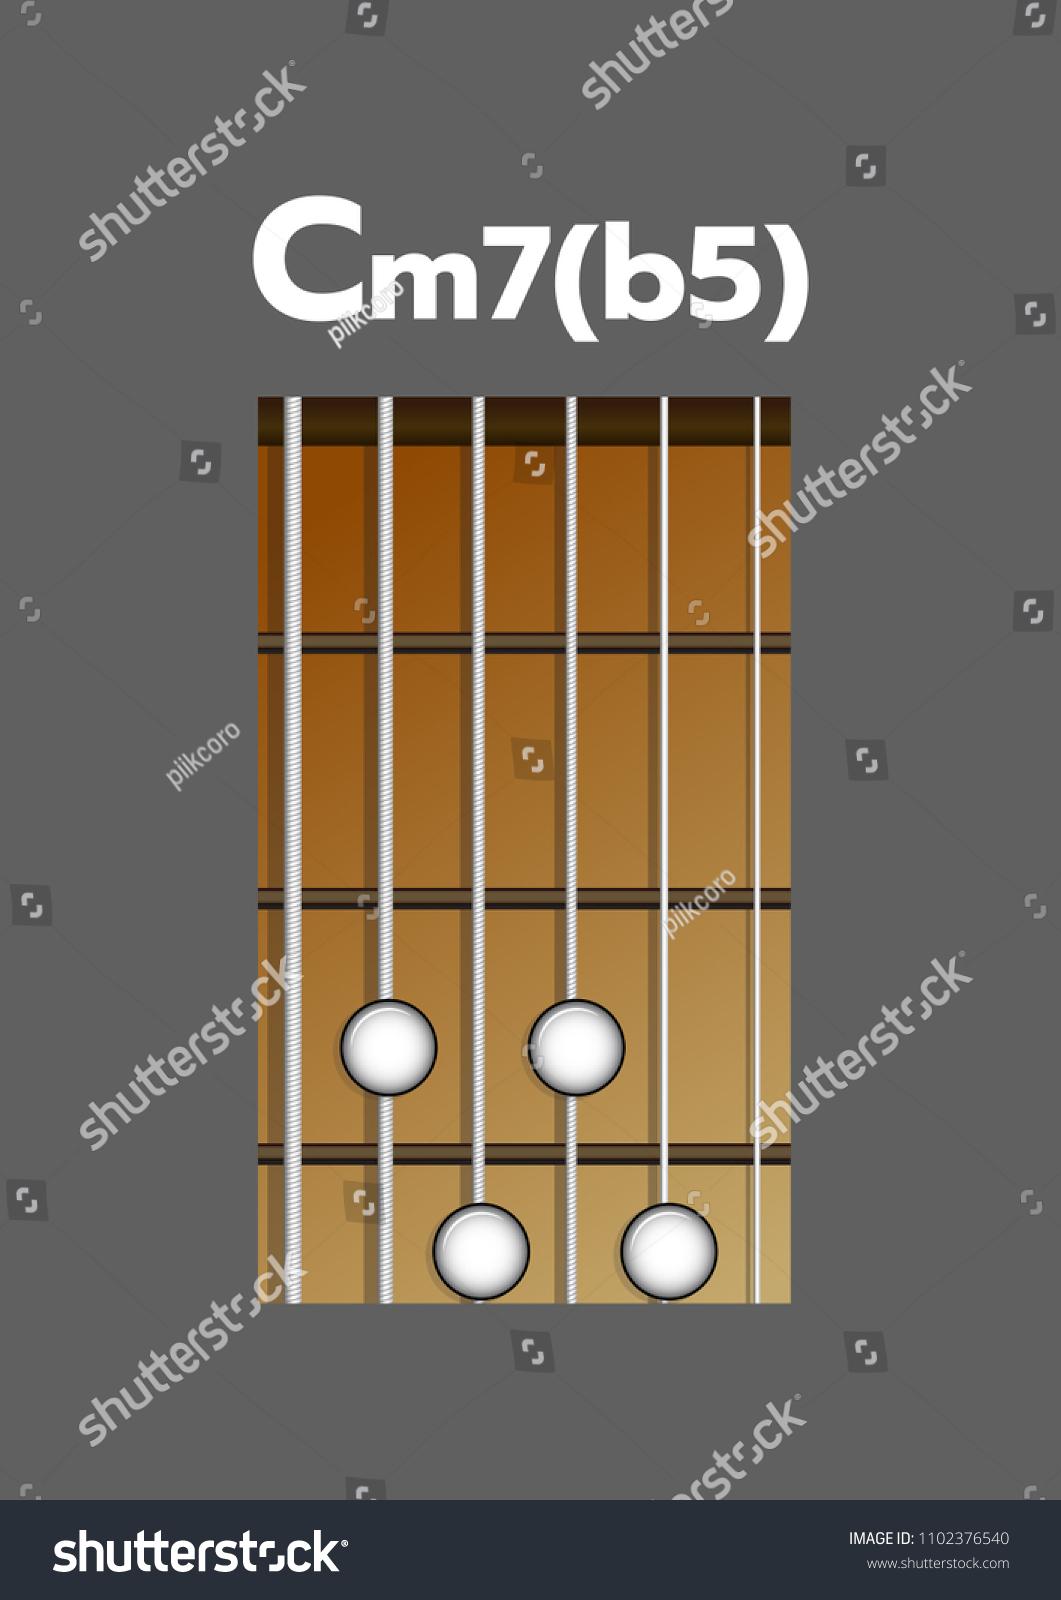 Chord Diagram Tab Tabulation Finger Chart Stock Vector Royalty Free Electric Guitar Basic Chords Cm7